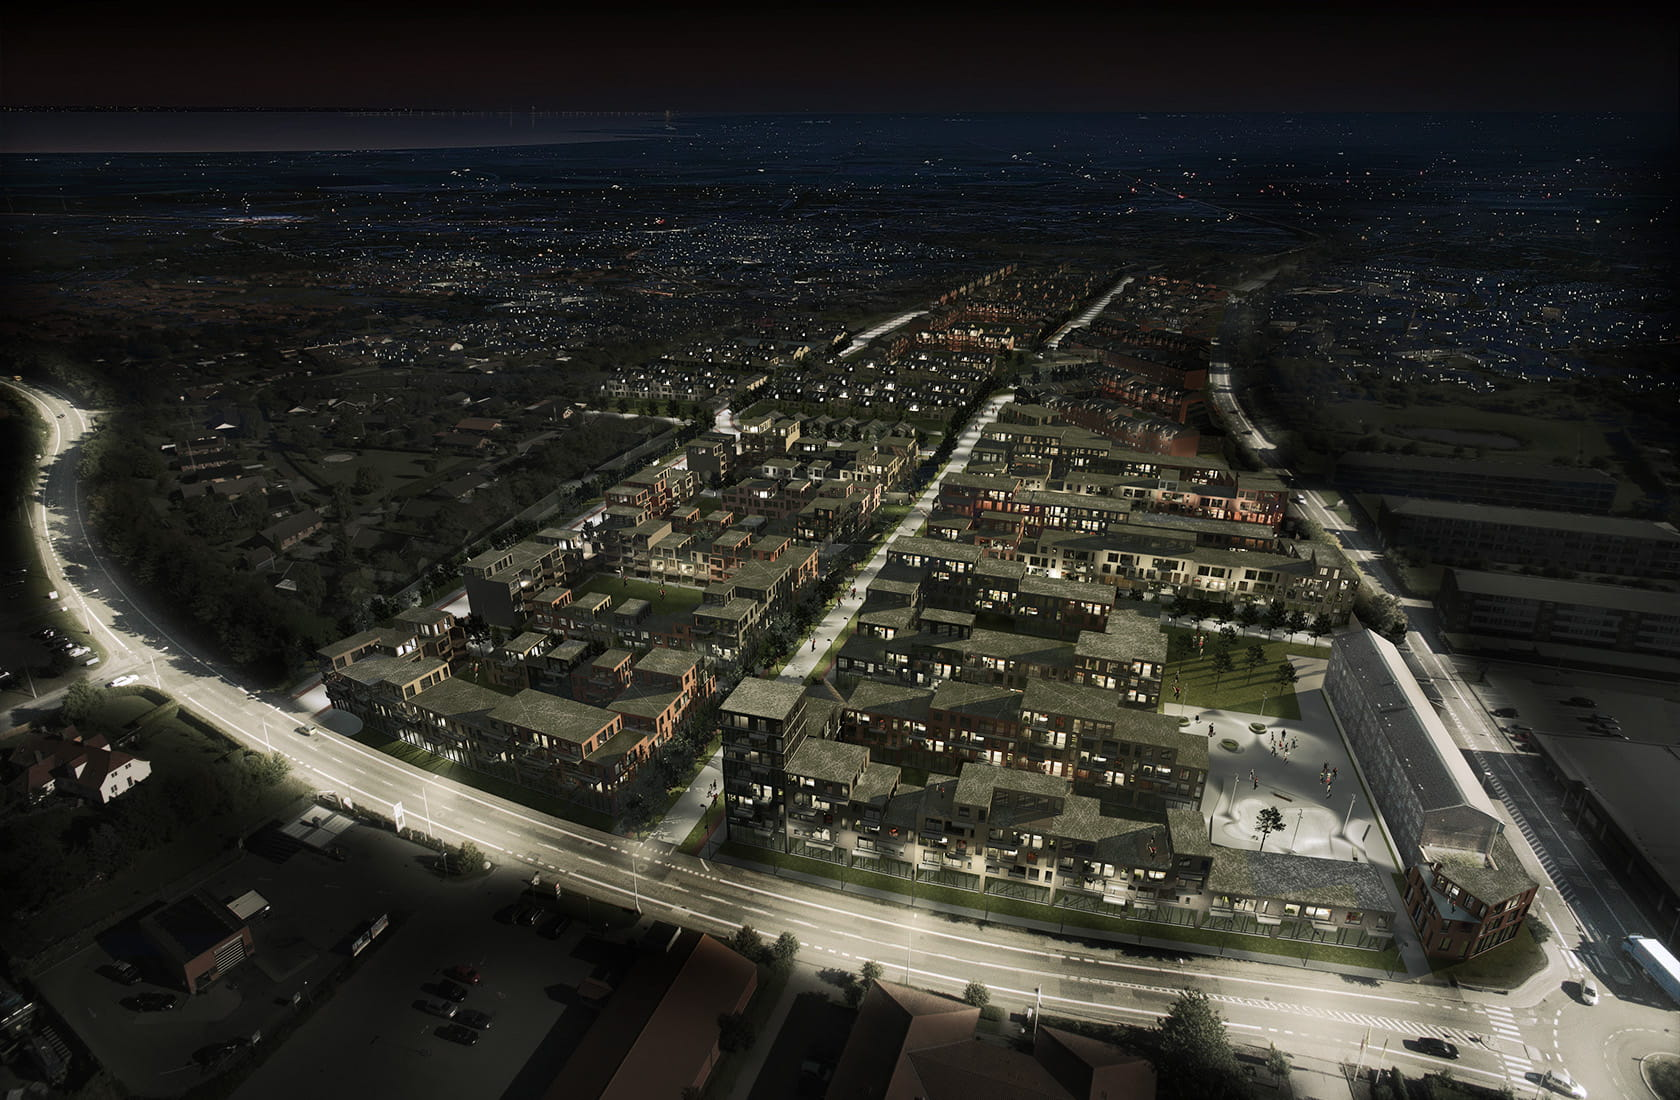 Visionsplan Ringparken night overview